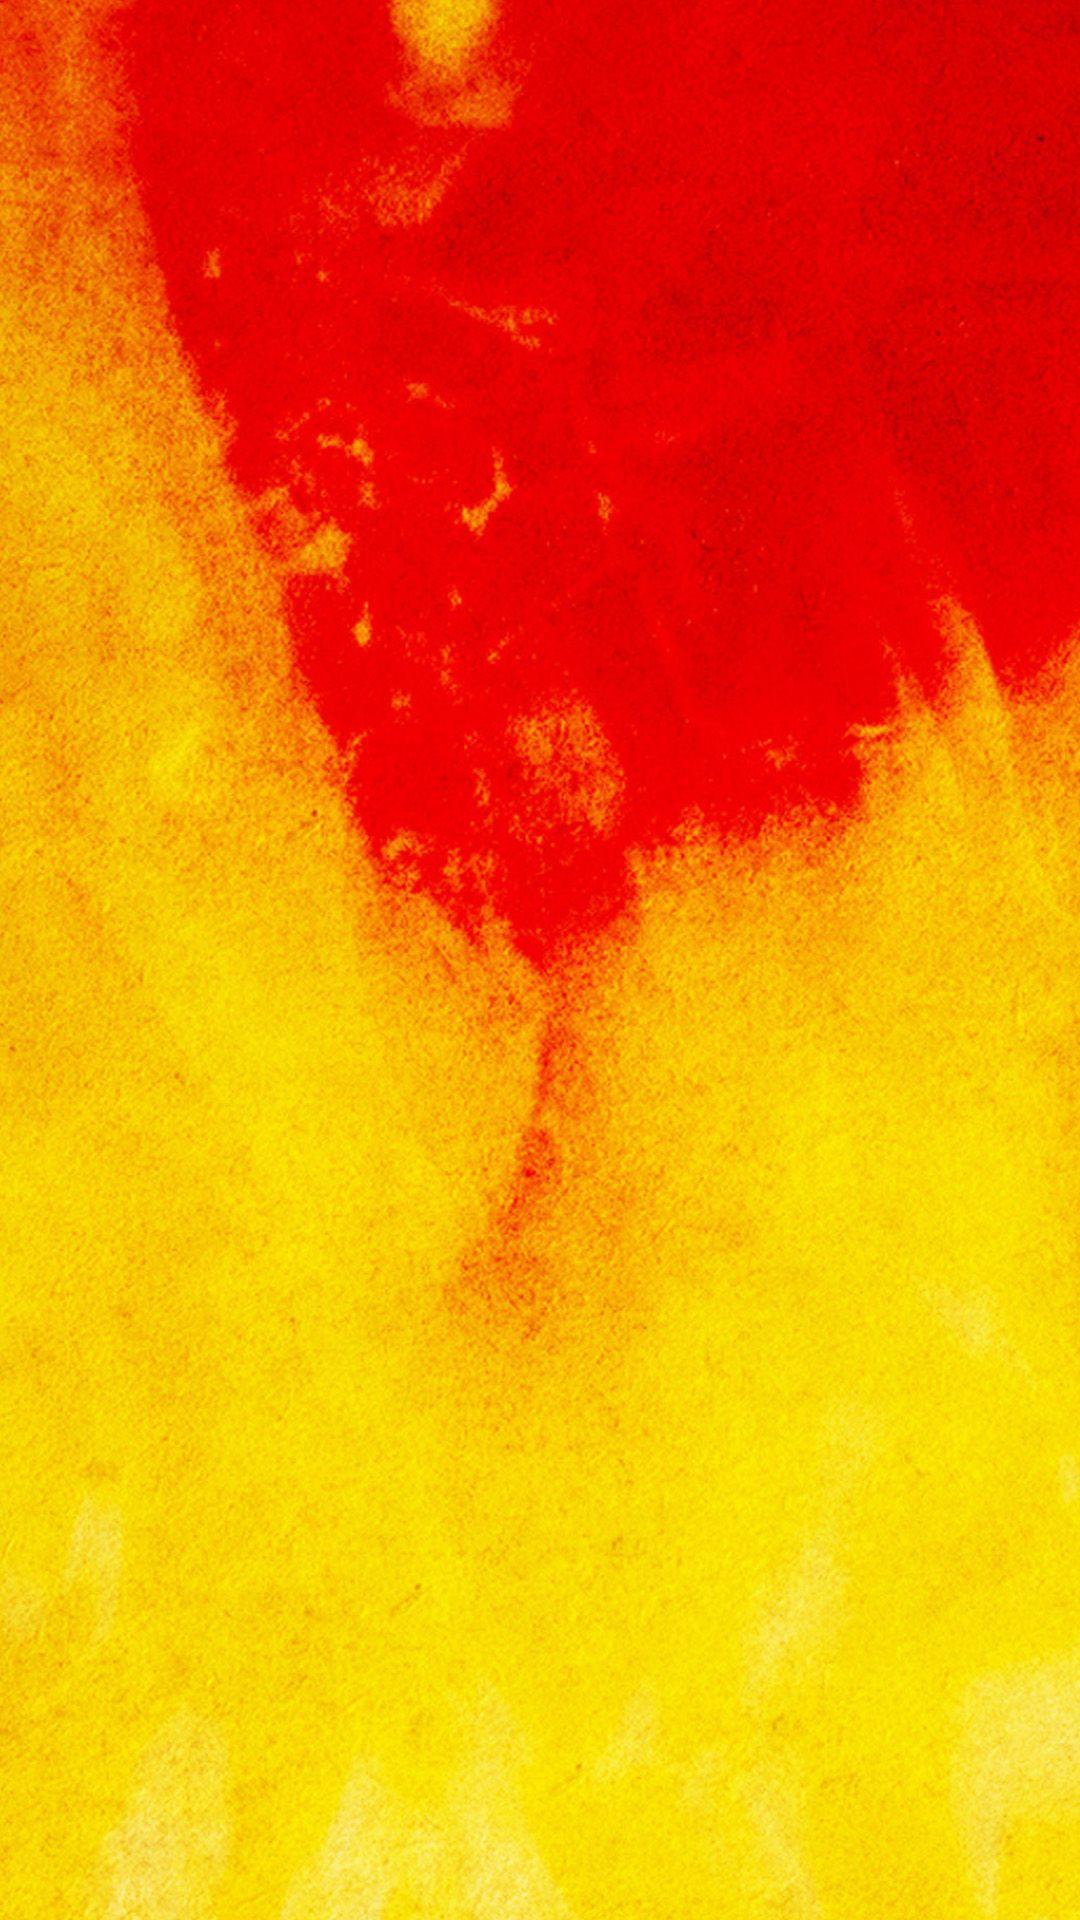 Fire 1 Htc One M8 Wallpaper Red Wallpaper Wallpaper Abstract